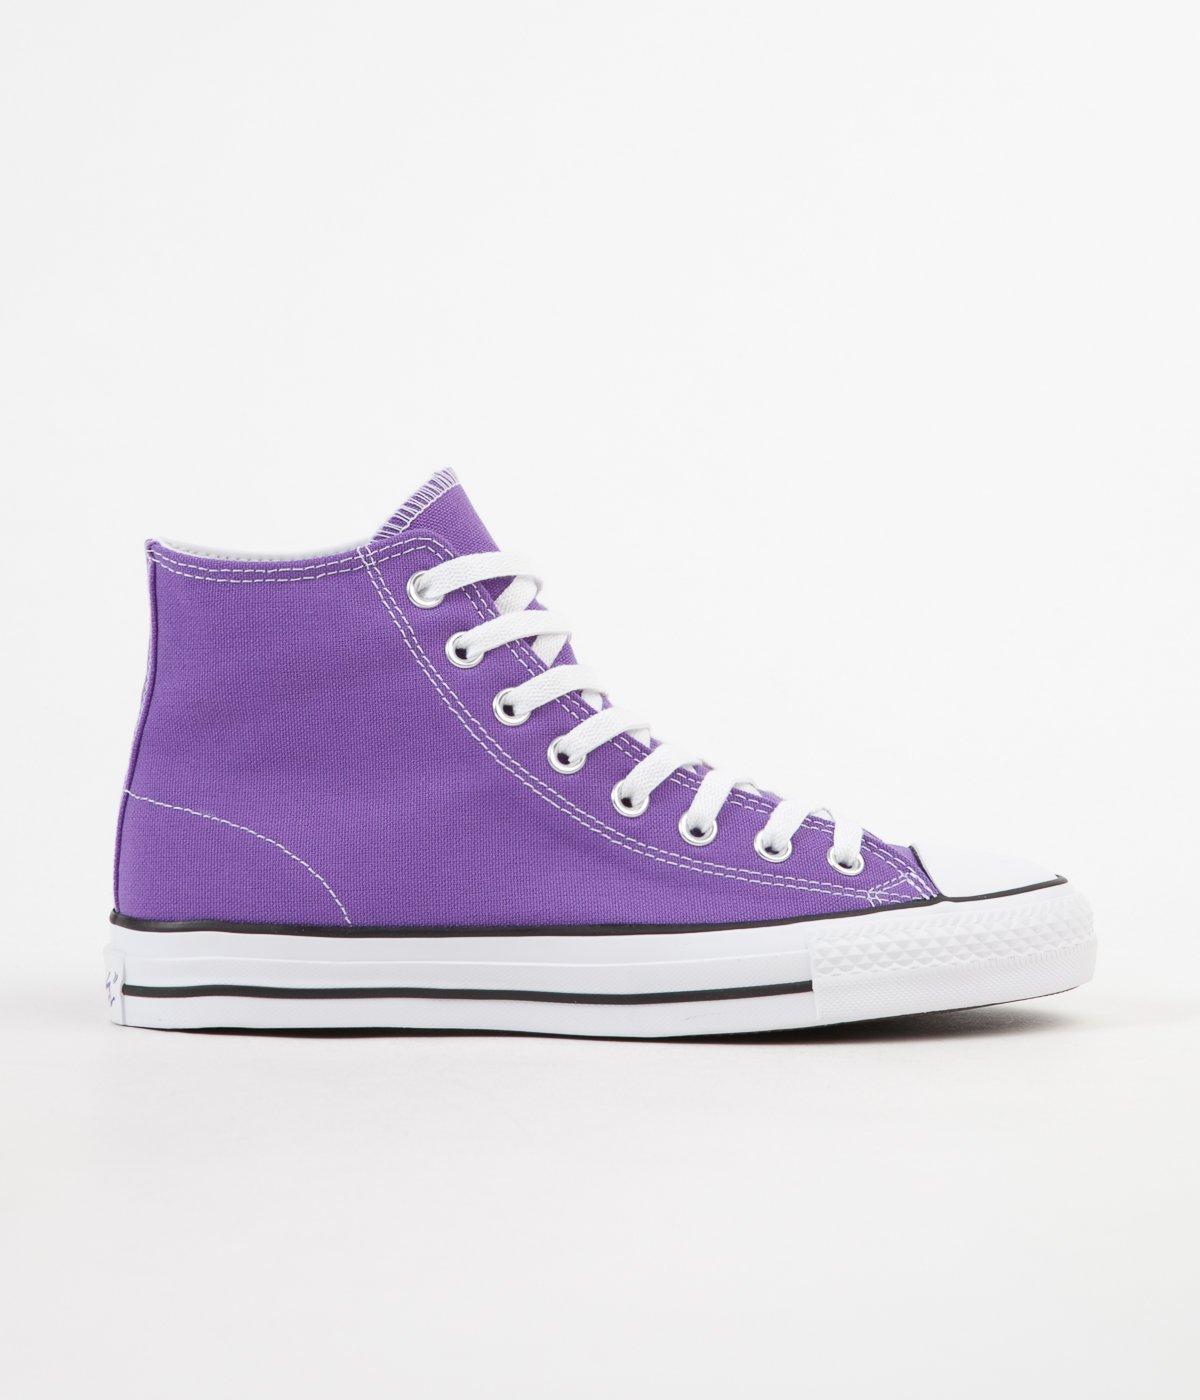 384c39e45a9e Cons CTAS Pro Hi PURPLE electric purple black white